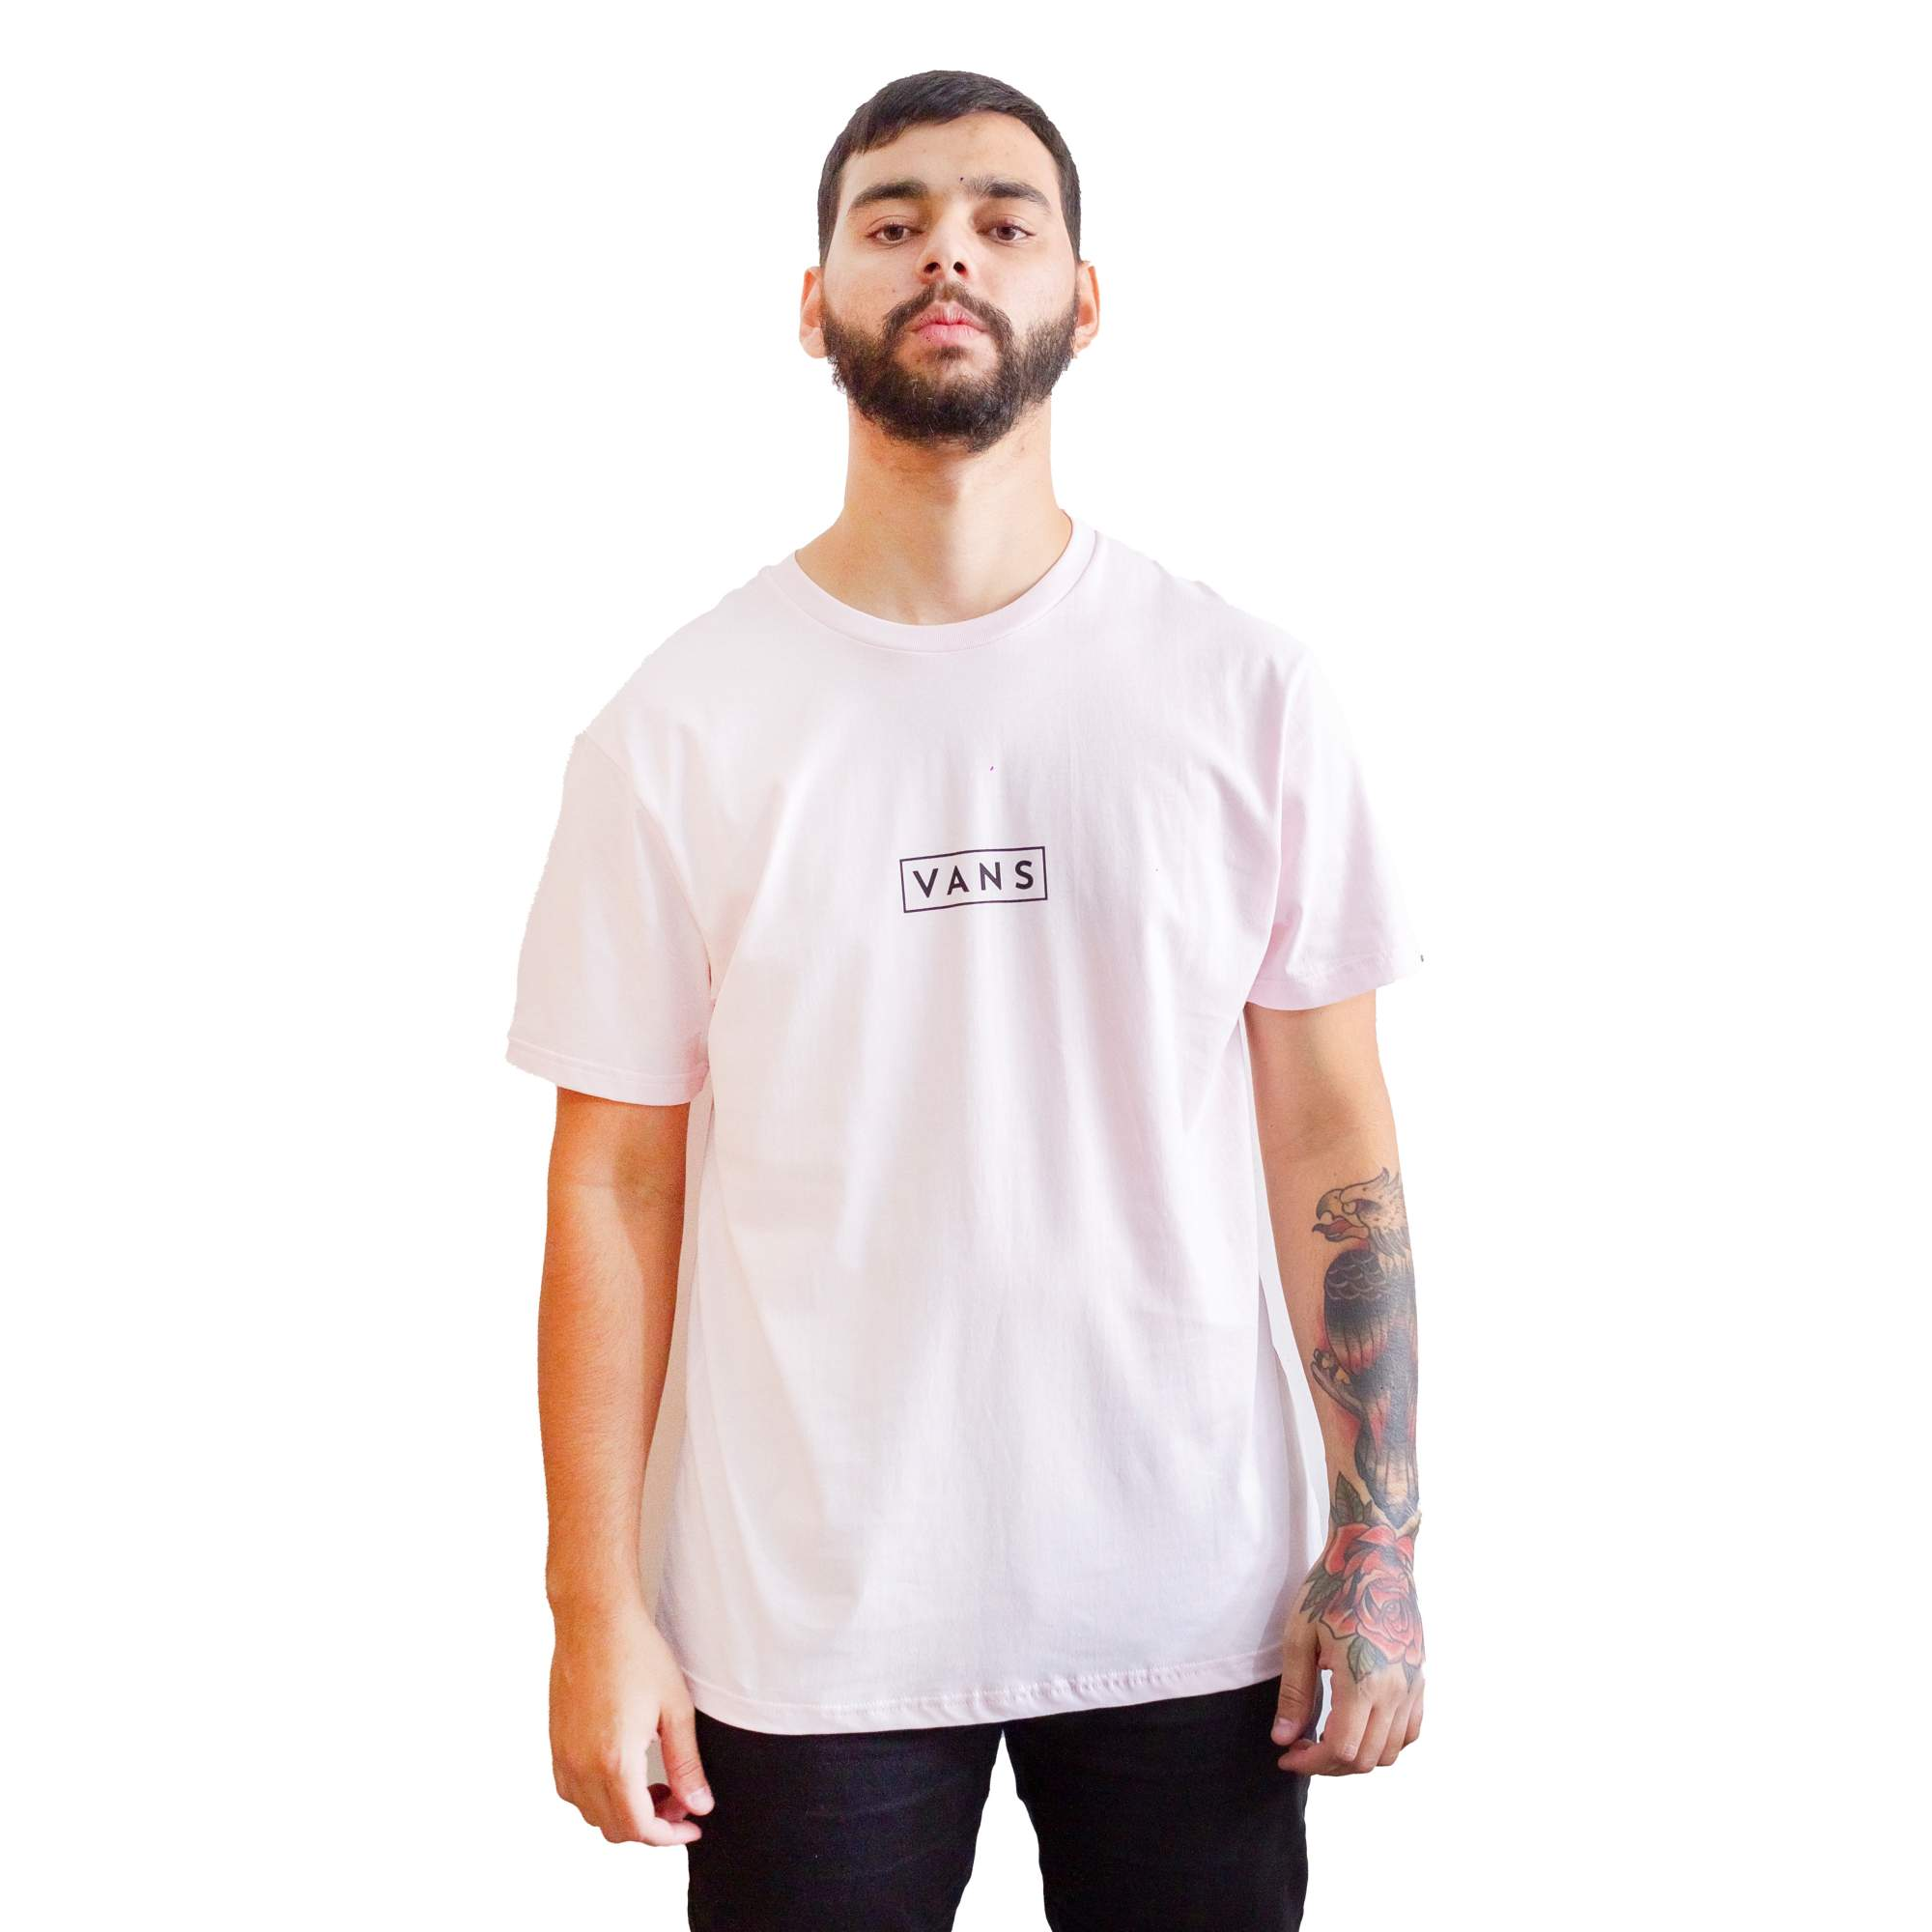 Camiseta Vans Basic Slim Fit